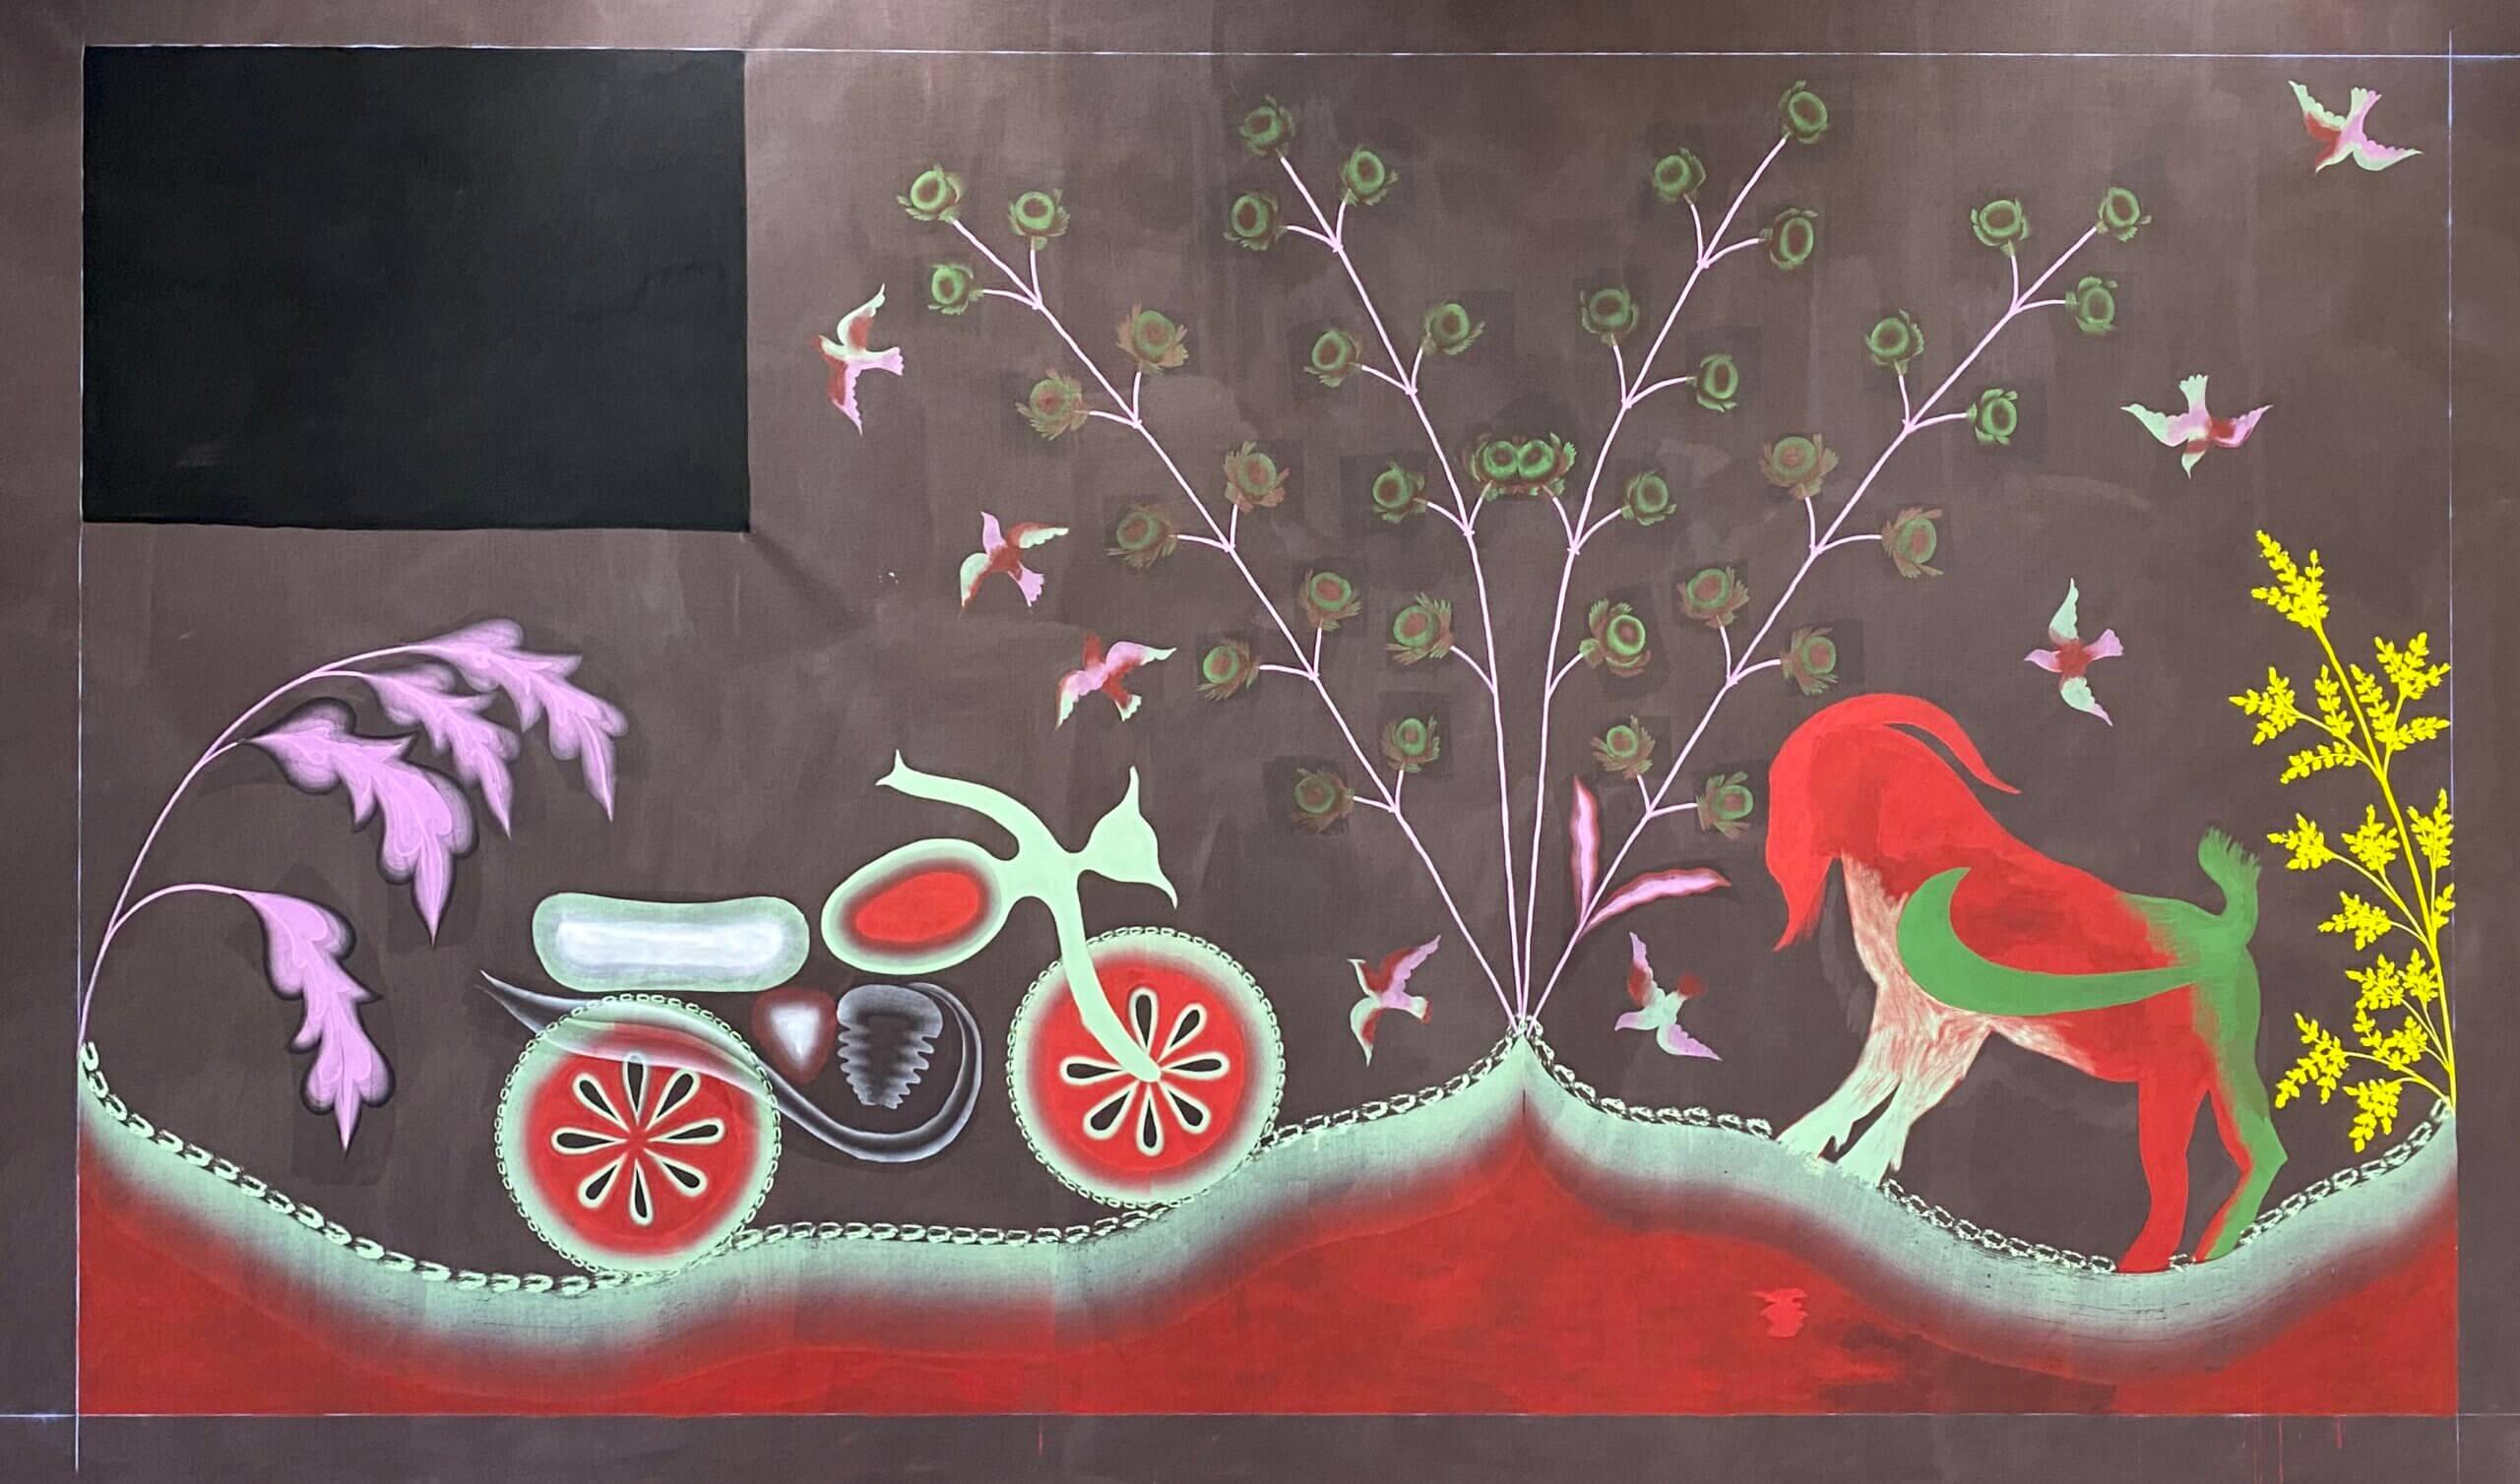 gijs frieling, mural, dmw gallery